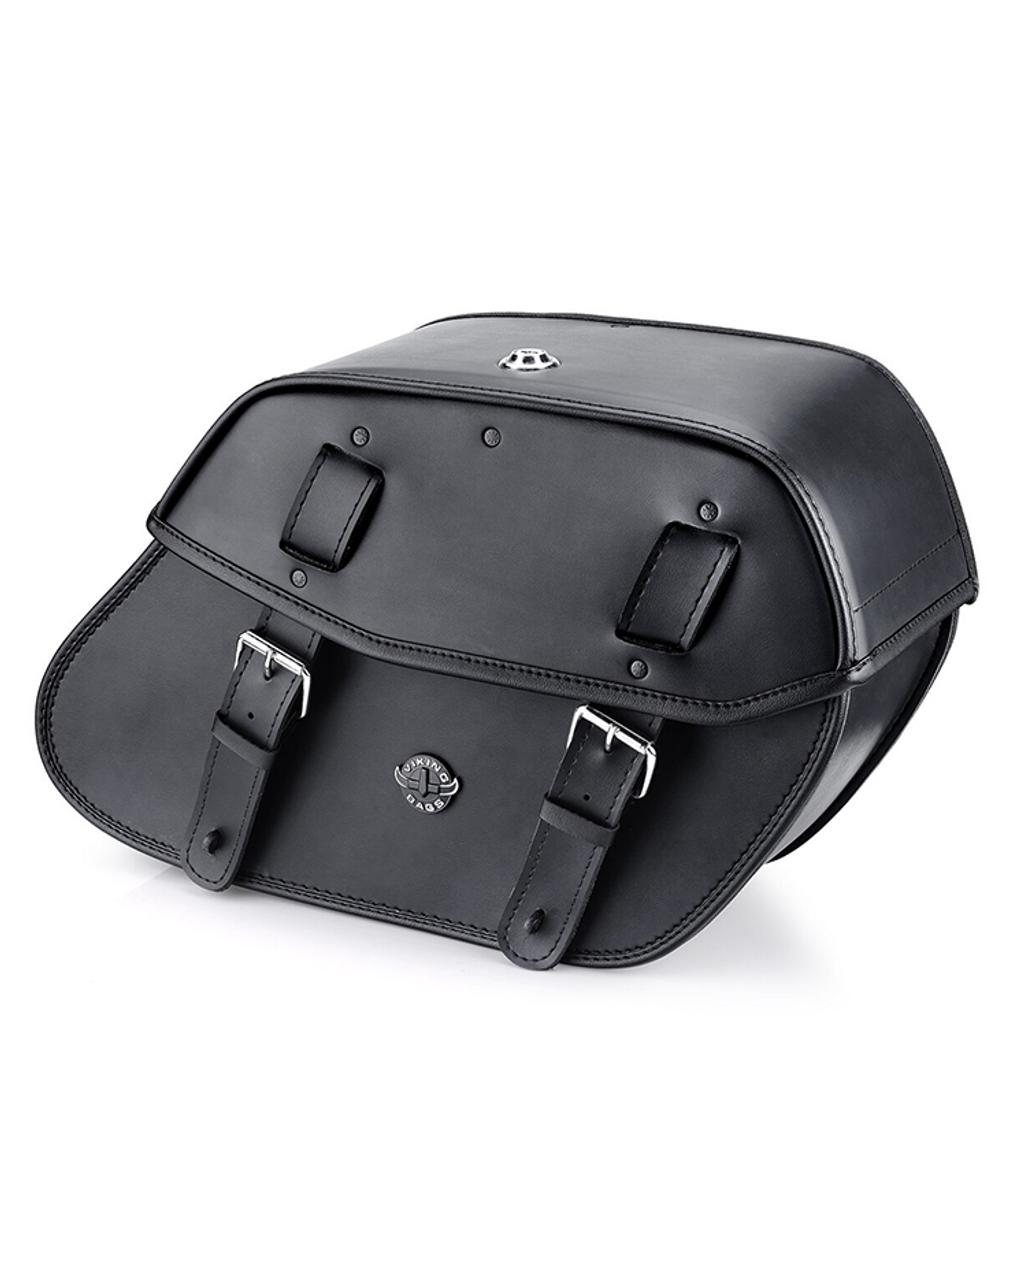 Viking Odin Large Motorcycle Saddlebags For Harley Softail Slim bag view